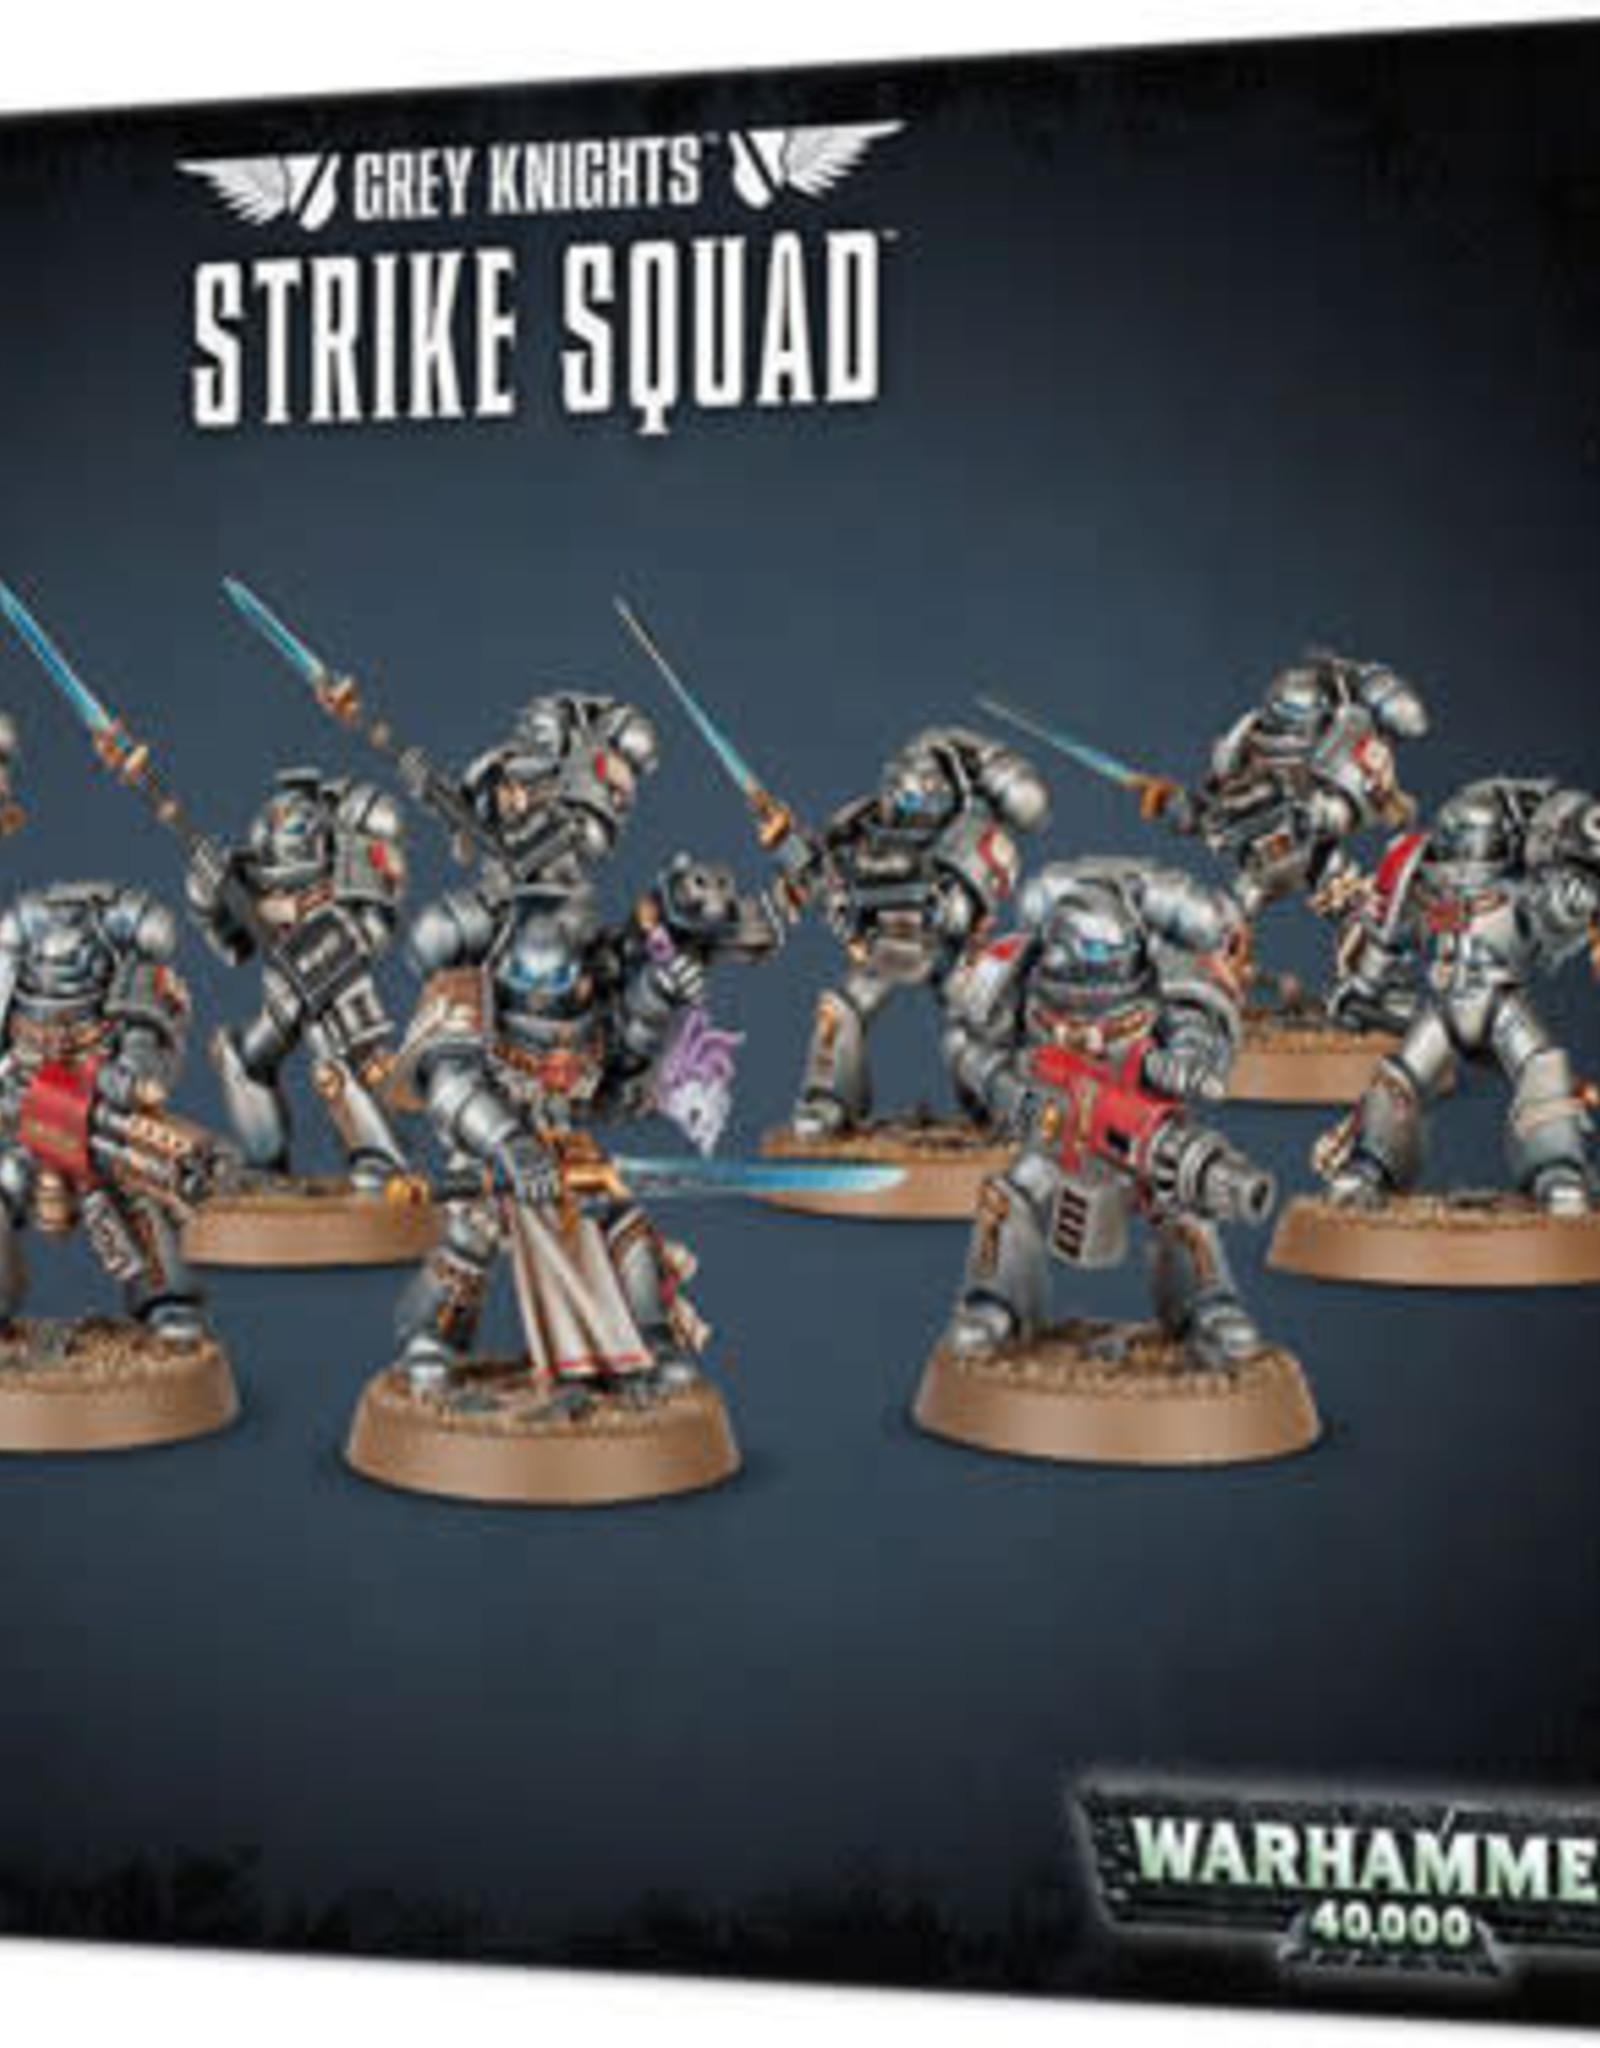 Warhammer 40K Grey Knights Strike Squad